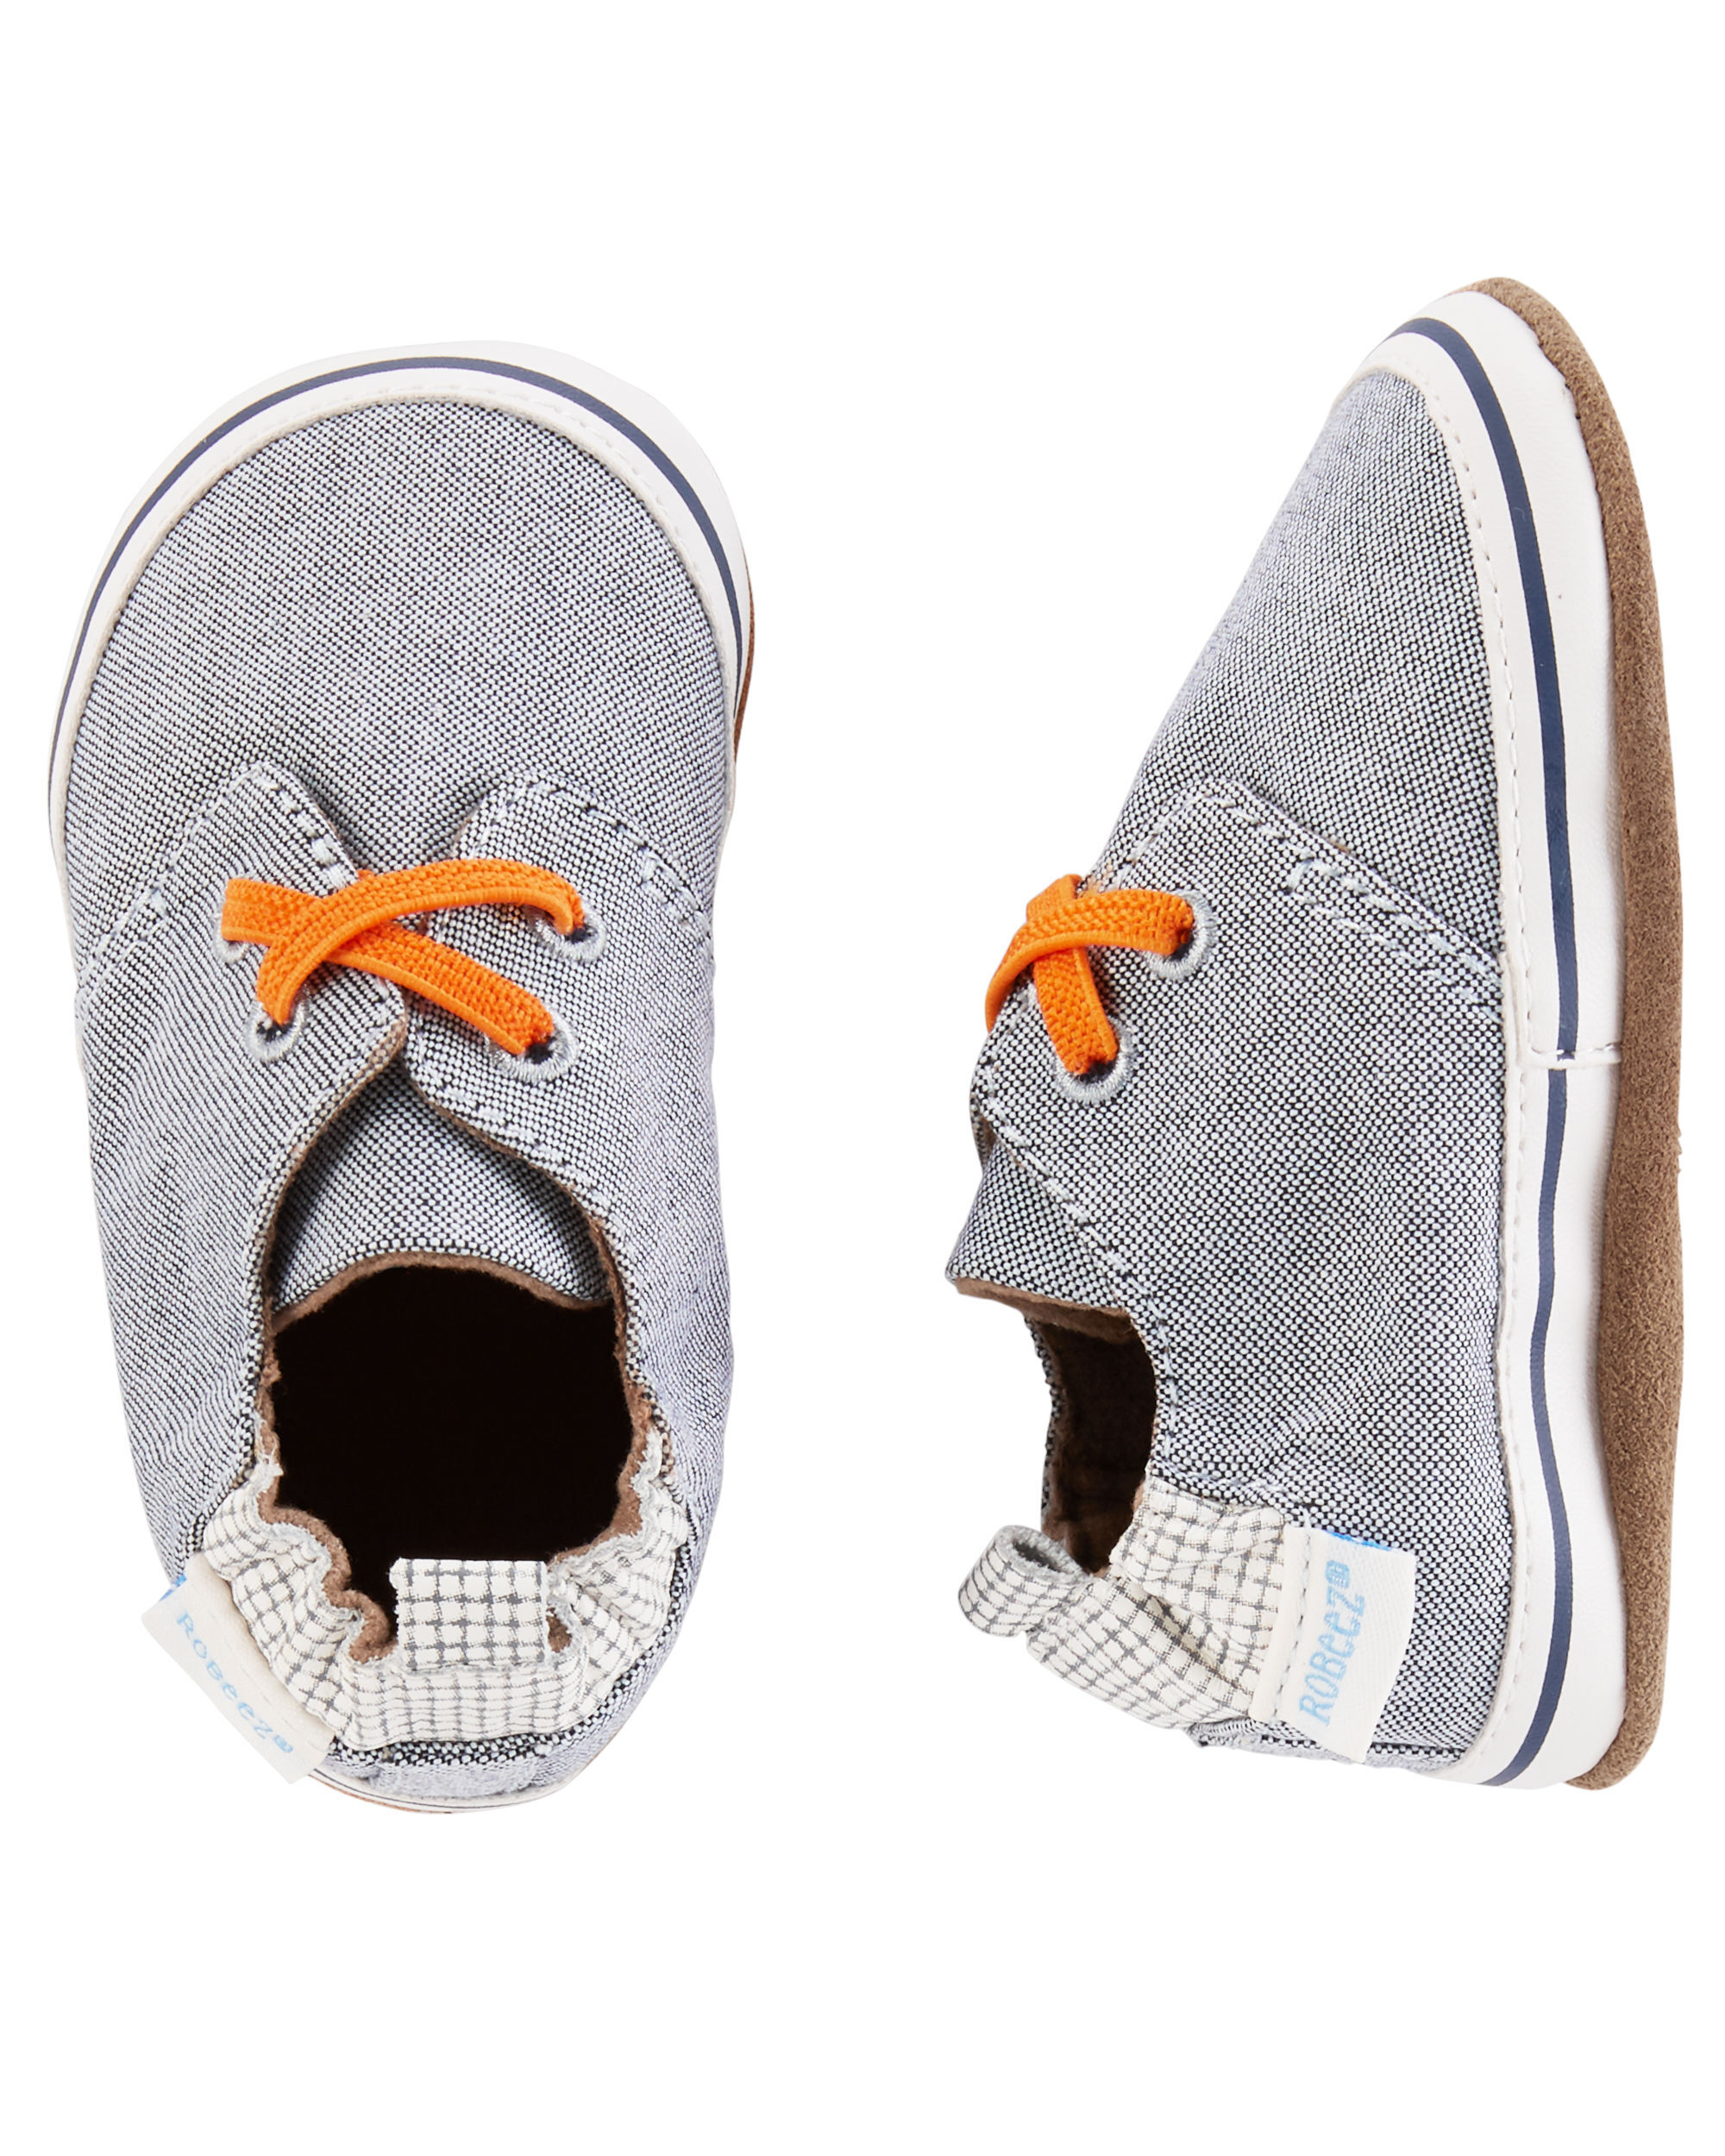 Cool \u0026 Casual Soft Sole Shoes | carters.com